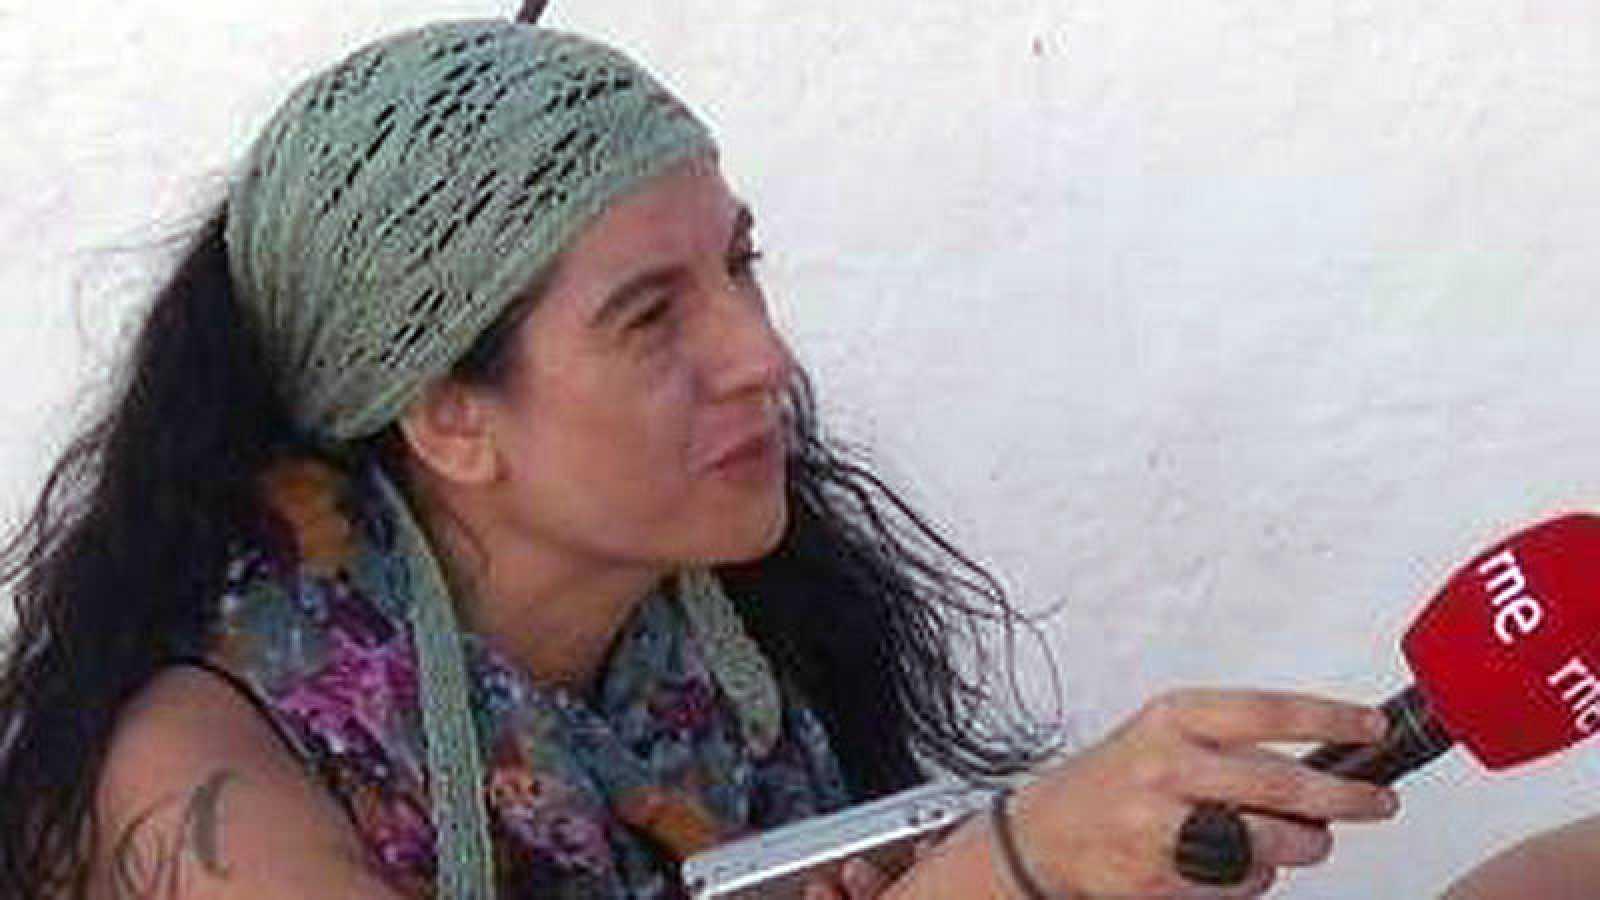 Cristina Sánchez, corresponsal de RNE en Jerusalén